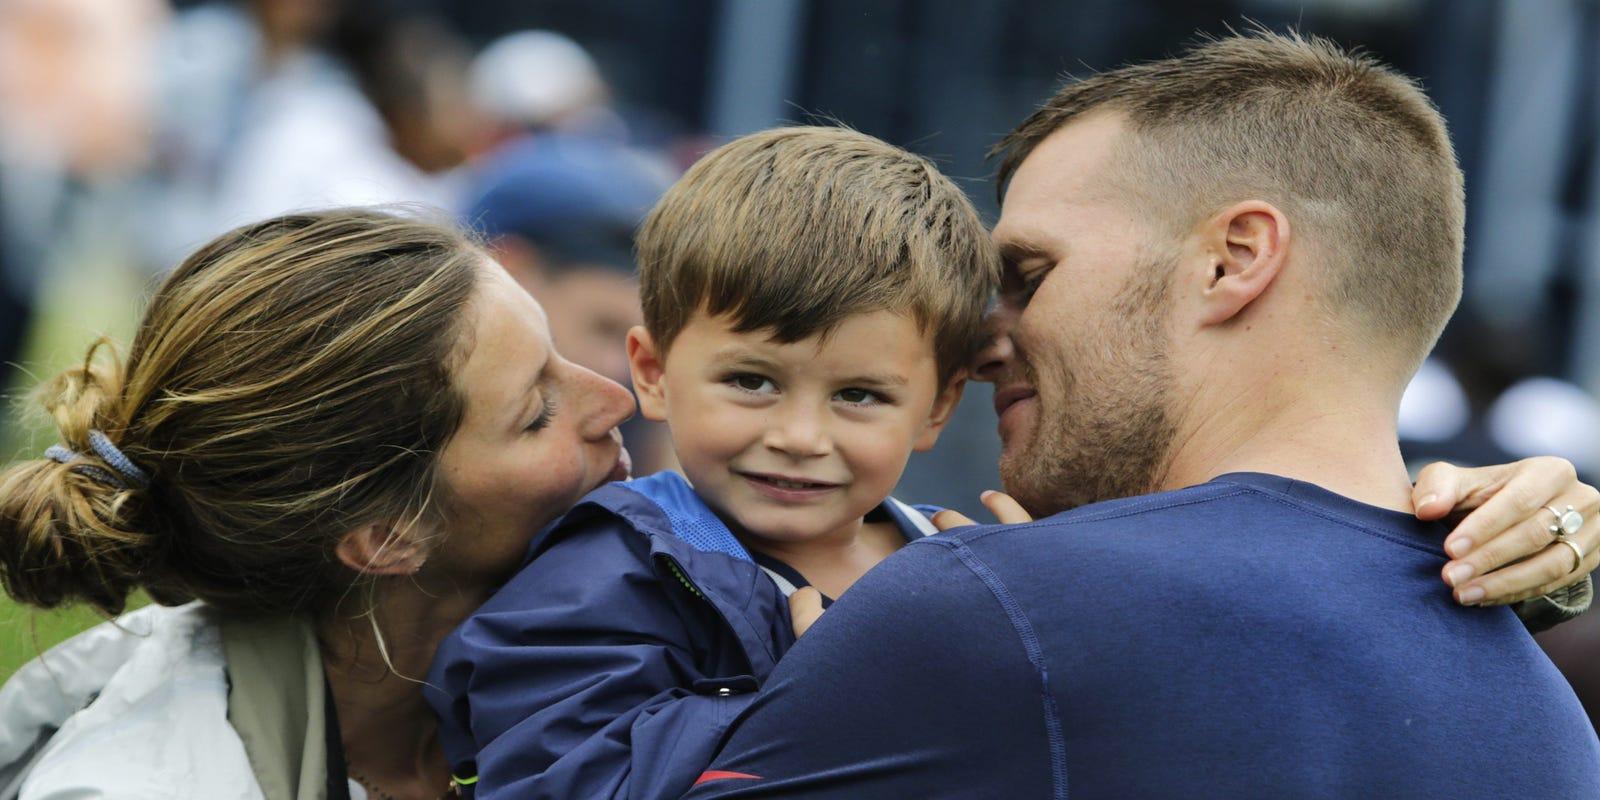 Tom Brady's wife Gisele helped him accept son's disinterest in sports